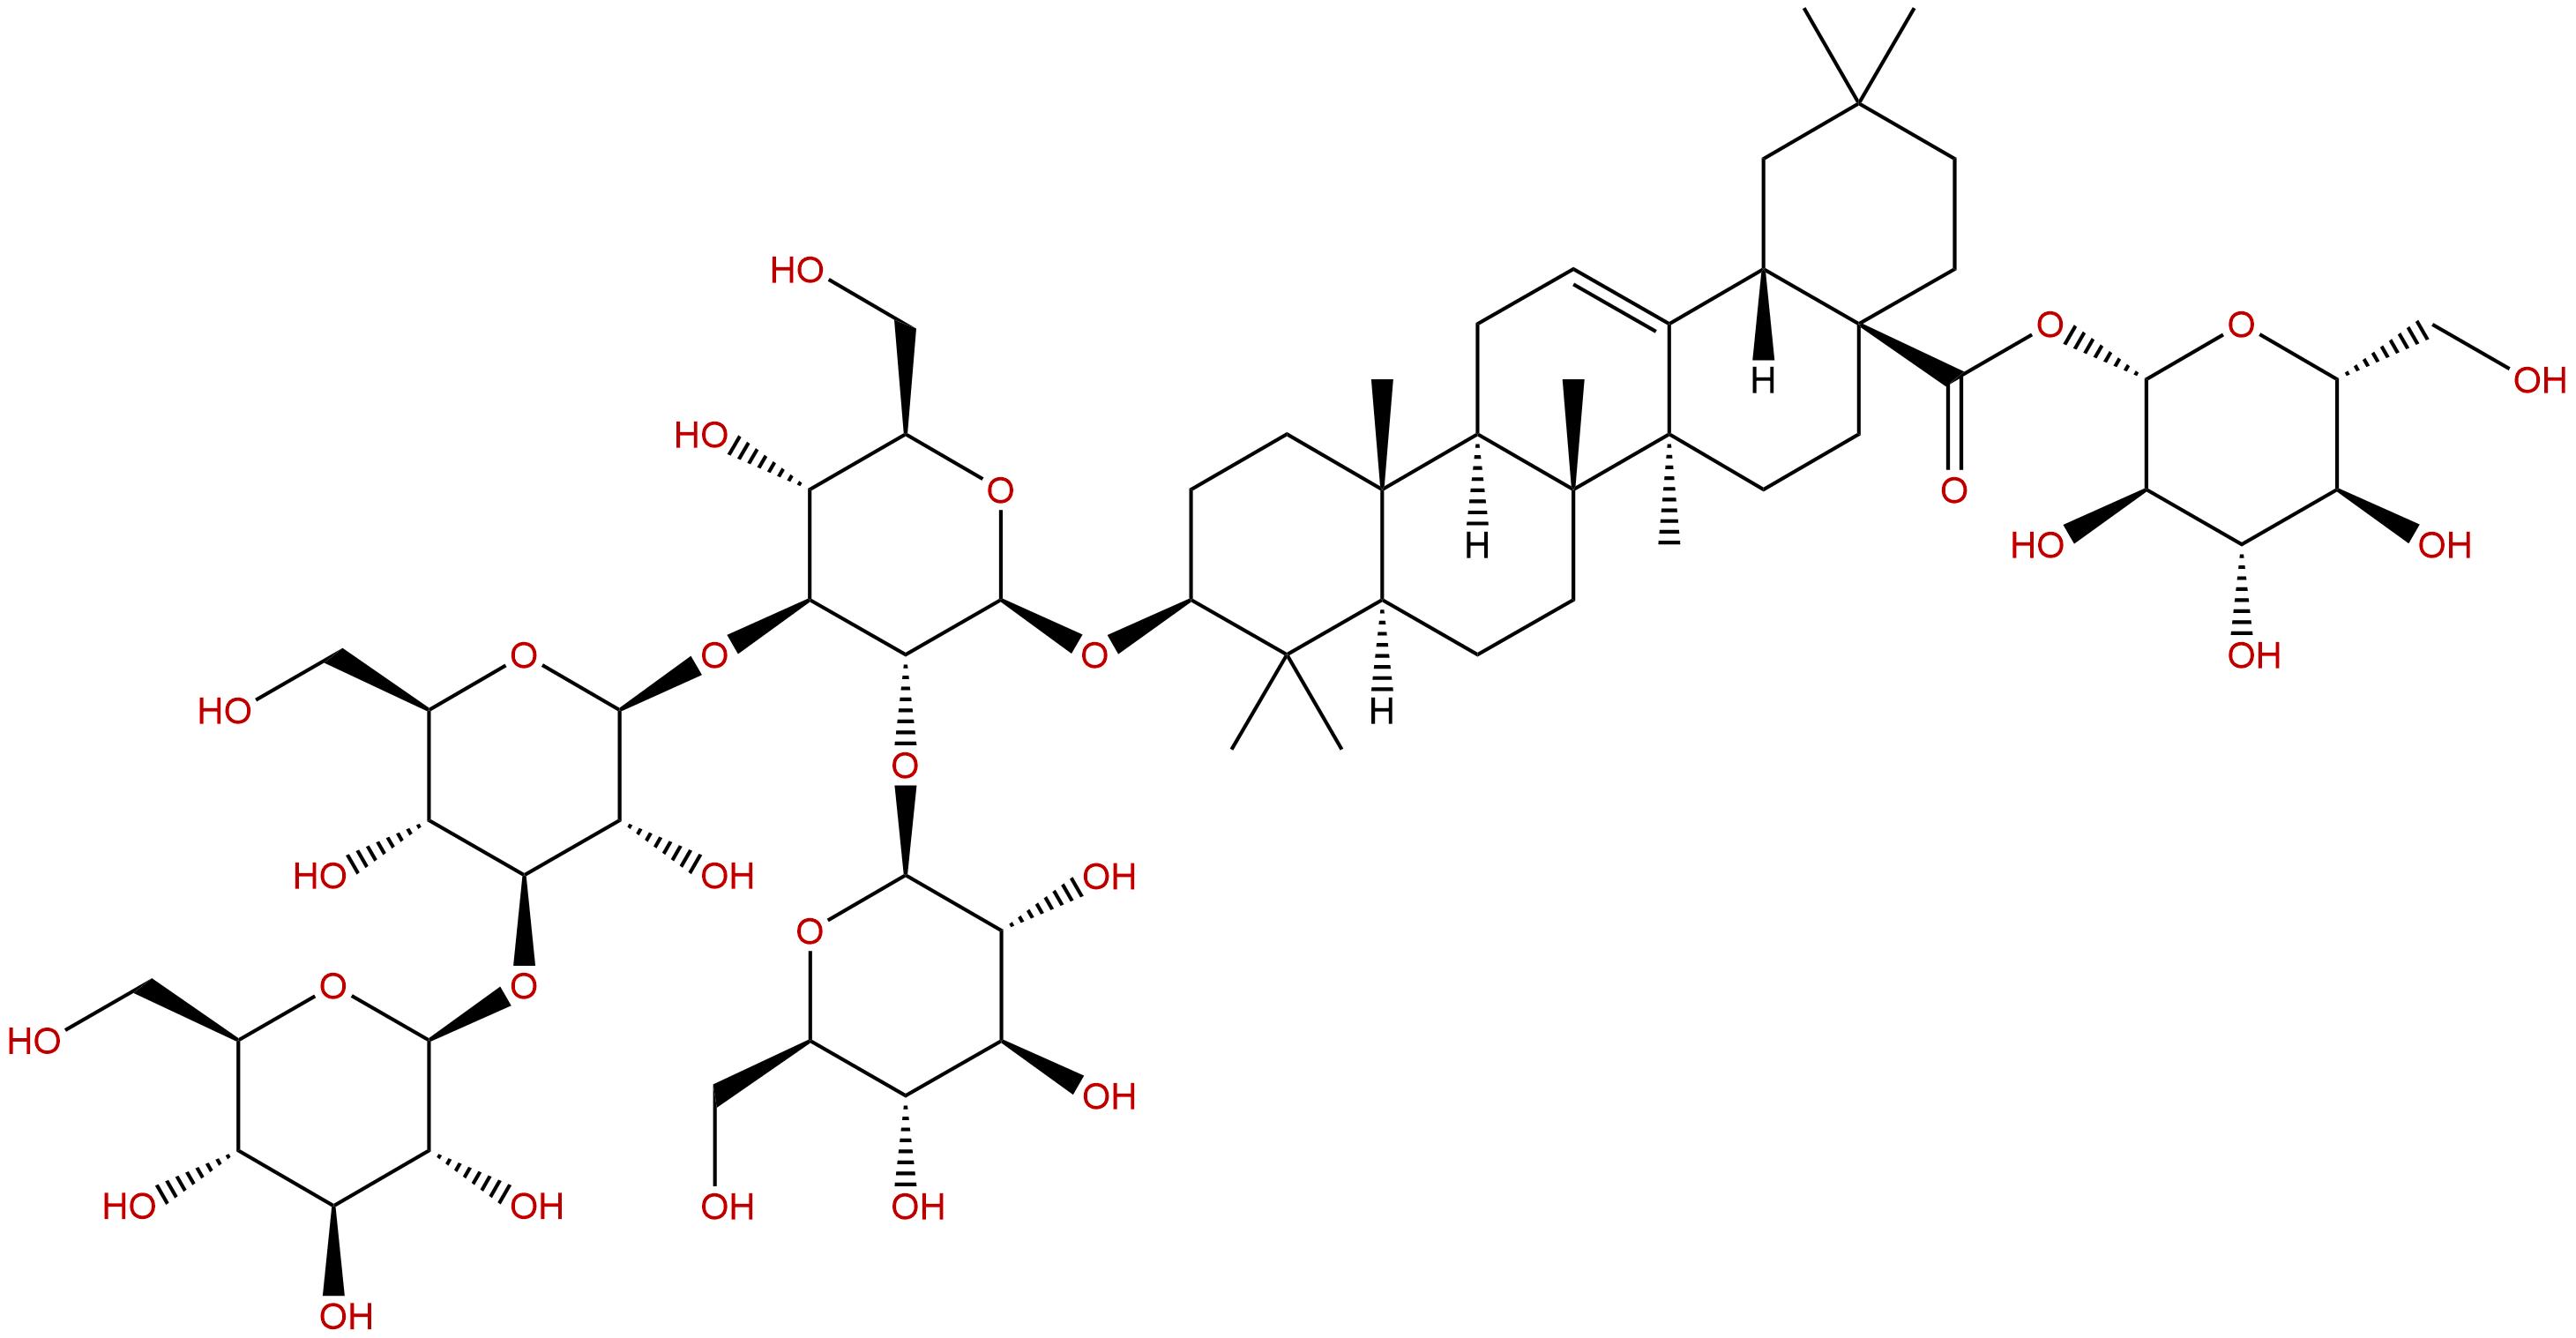 Congmunoside X